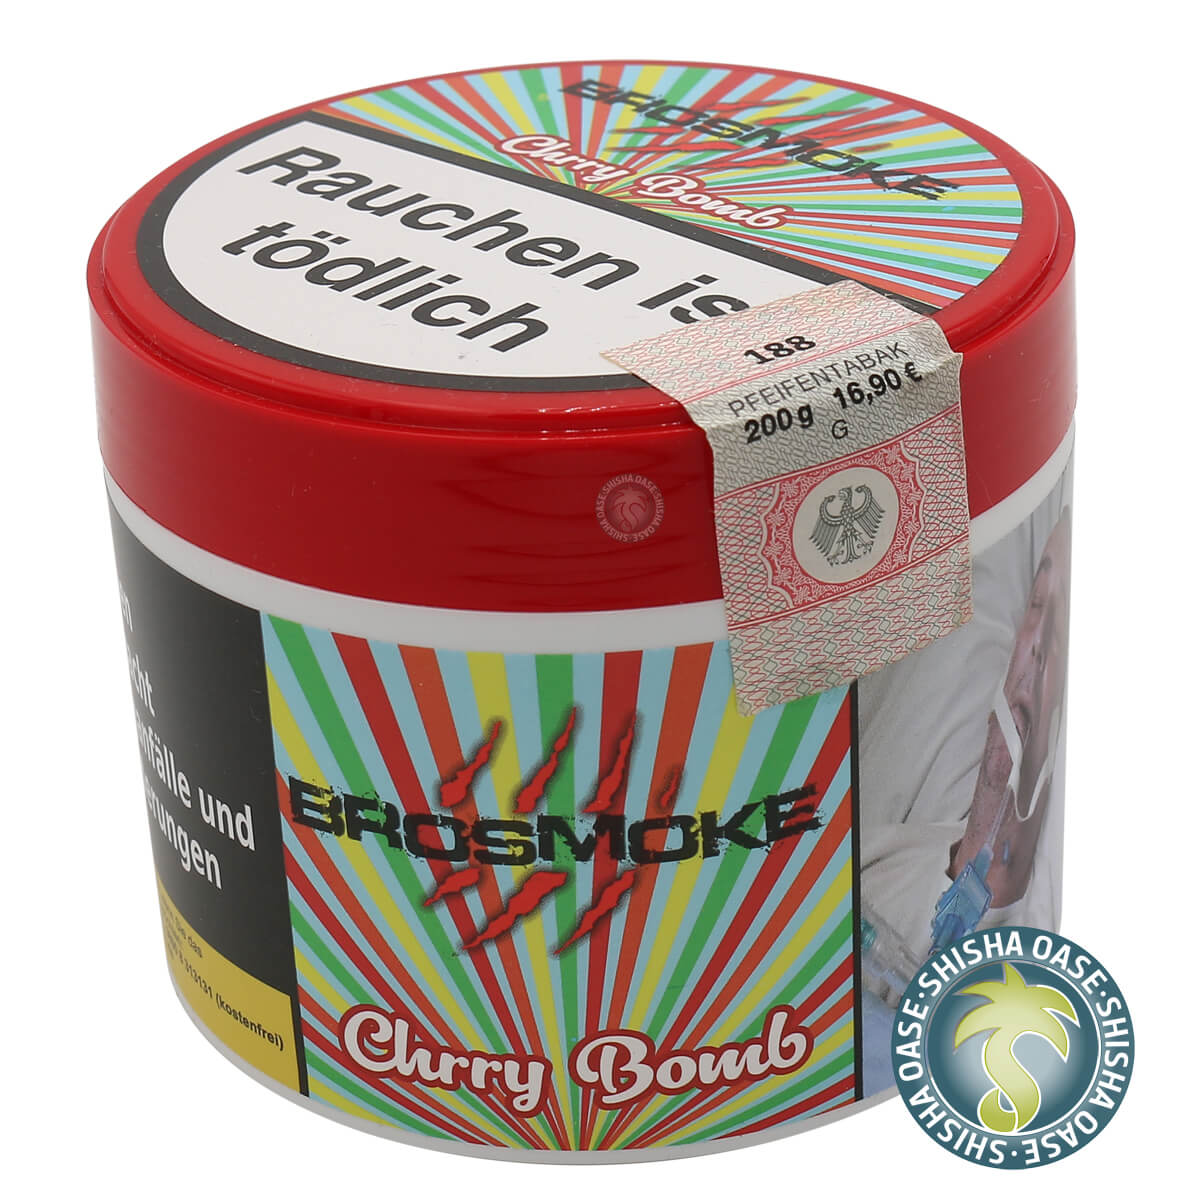 Brosmoke Tabak 200g Dose | Chrry Bomb